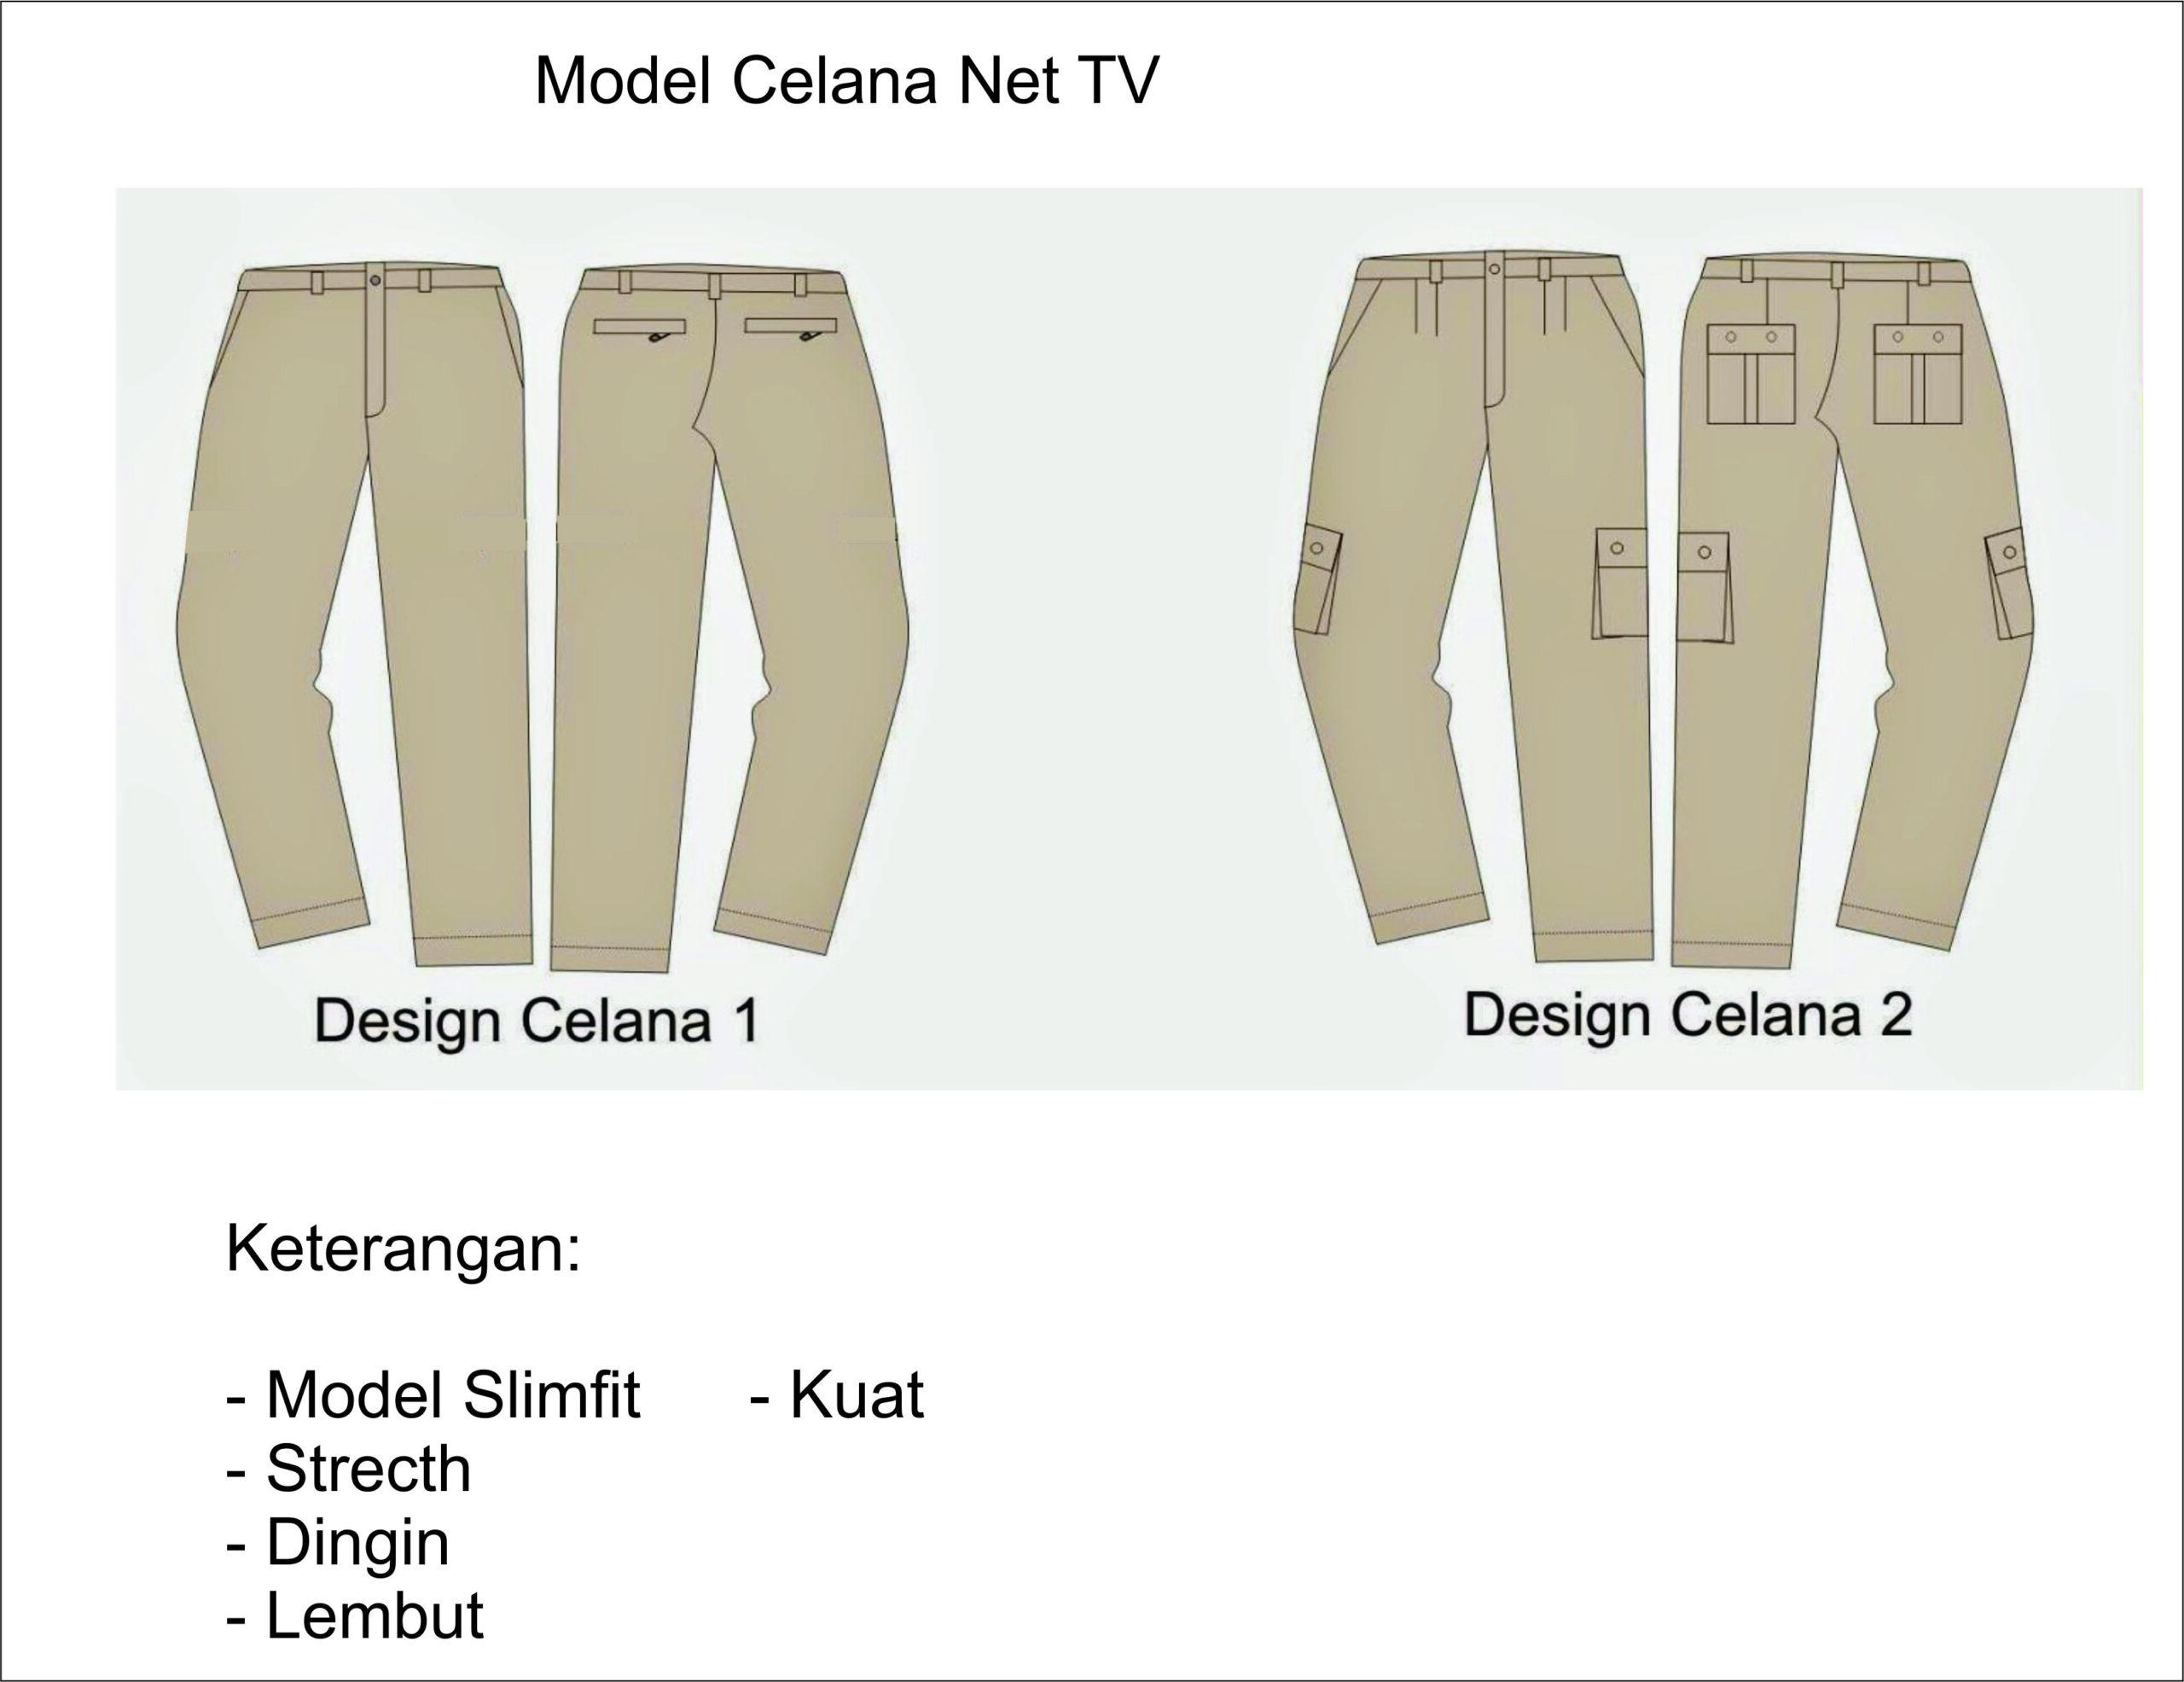 Celana NET TV inovator seragam